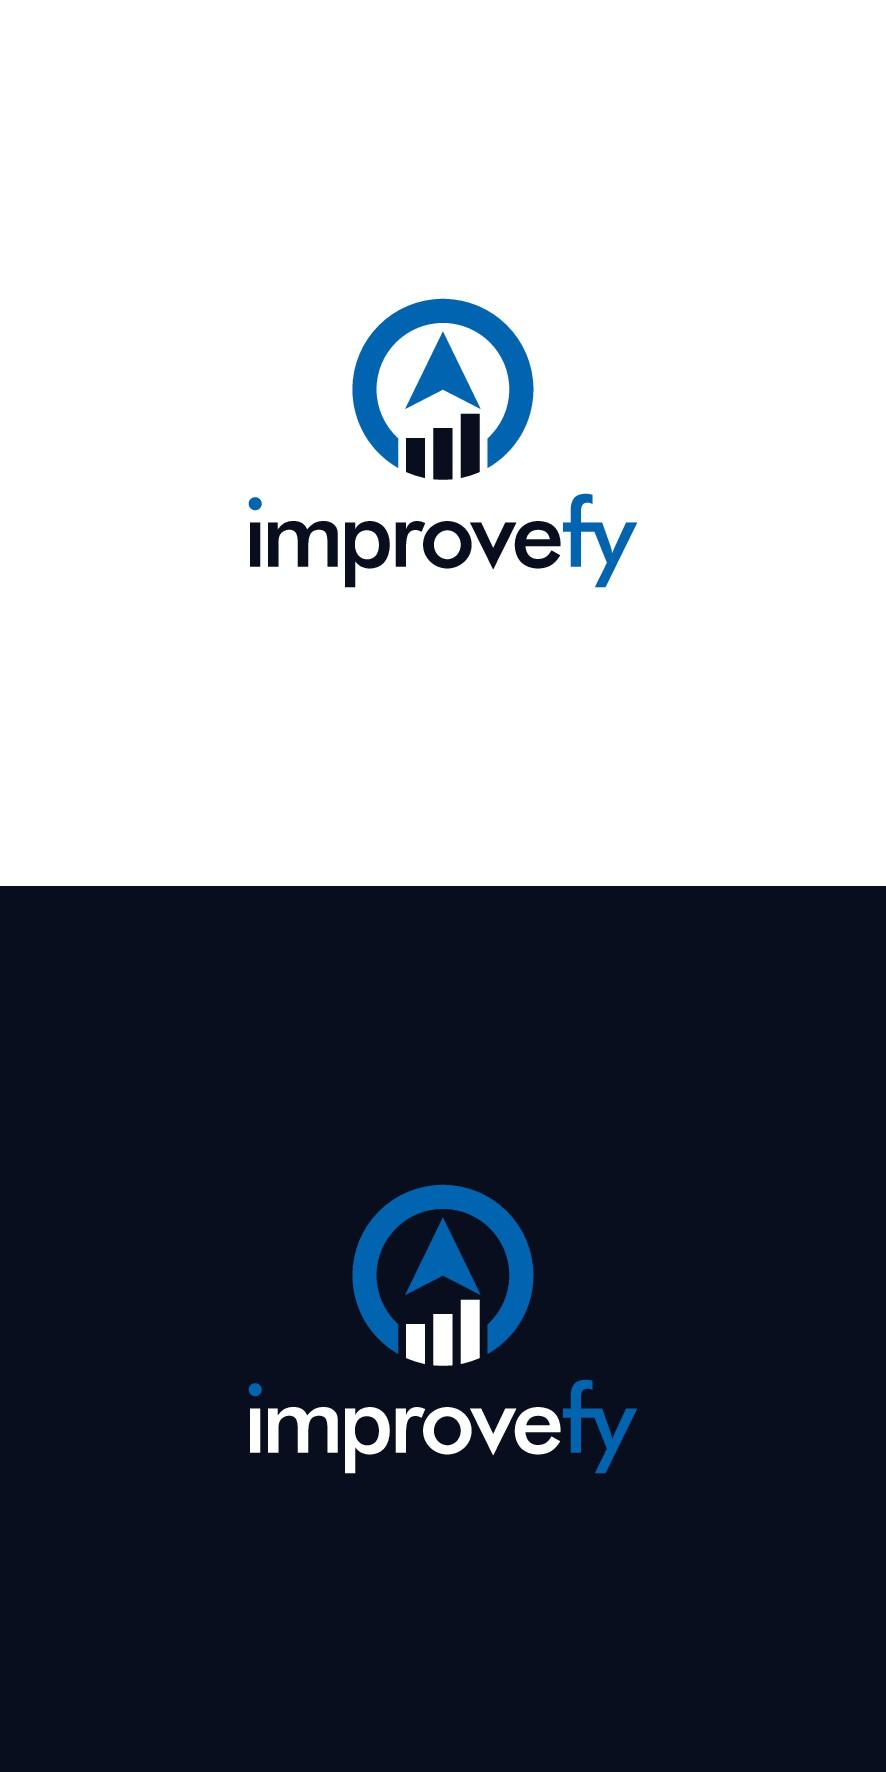 Improvefy needs a logo